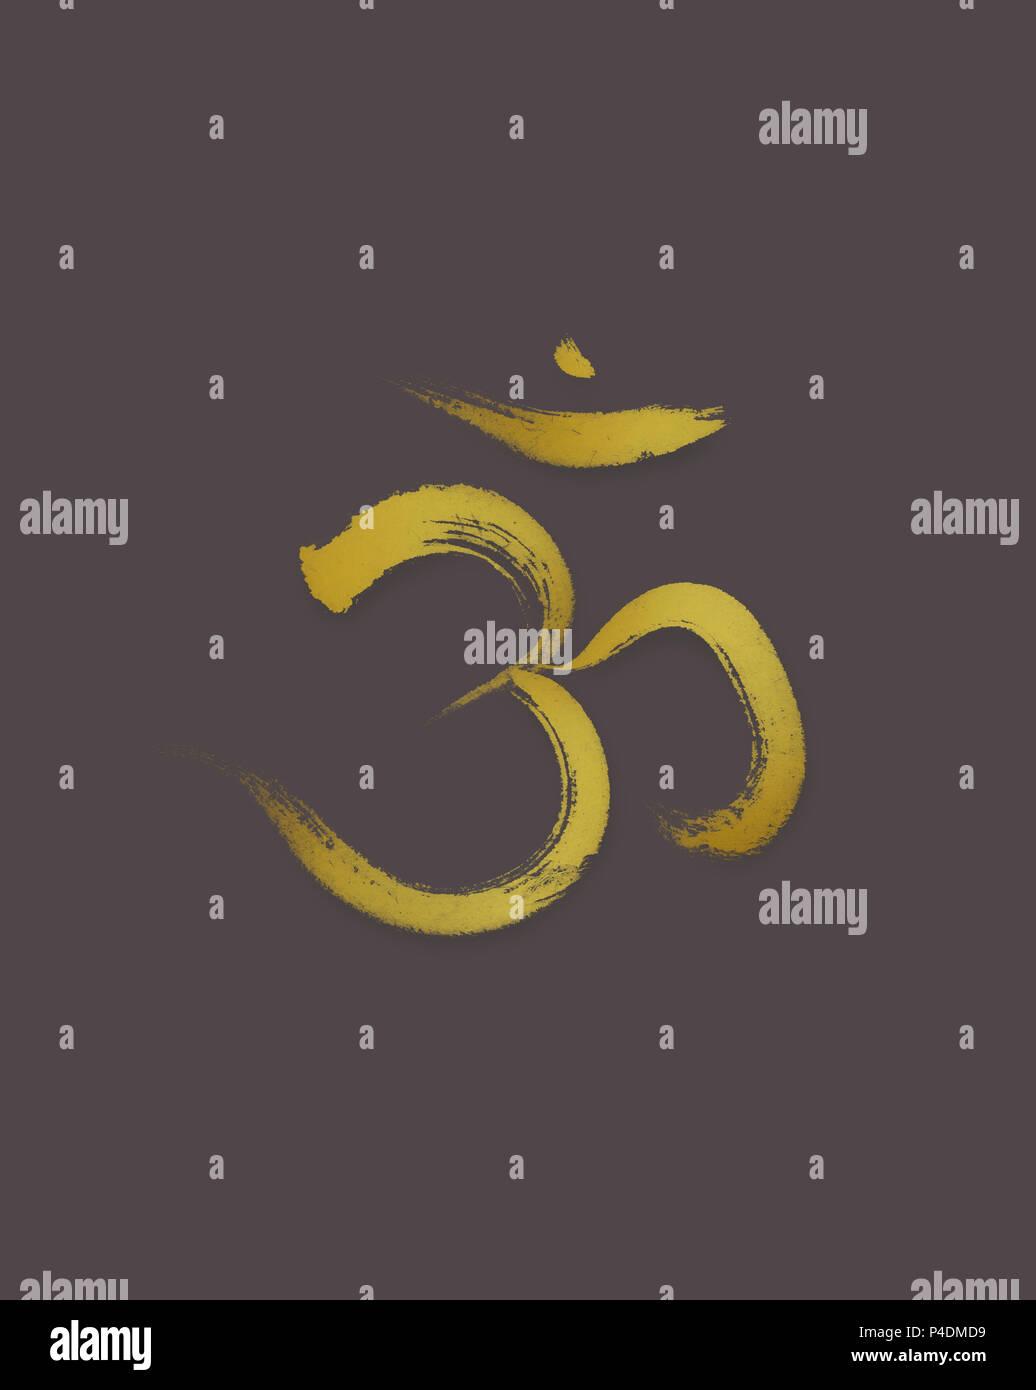 Sanscrit Sacred Symbol Om Or Aum In Yoga Spiritual Icon Golden